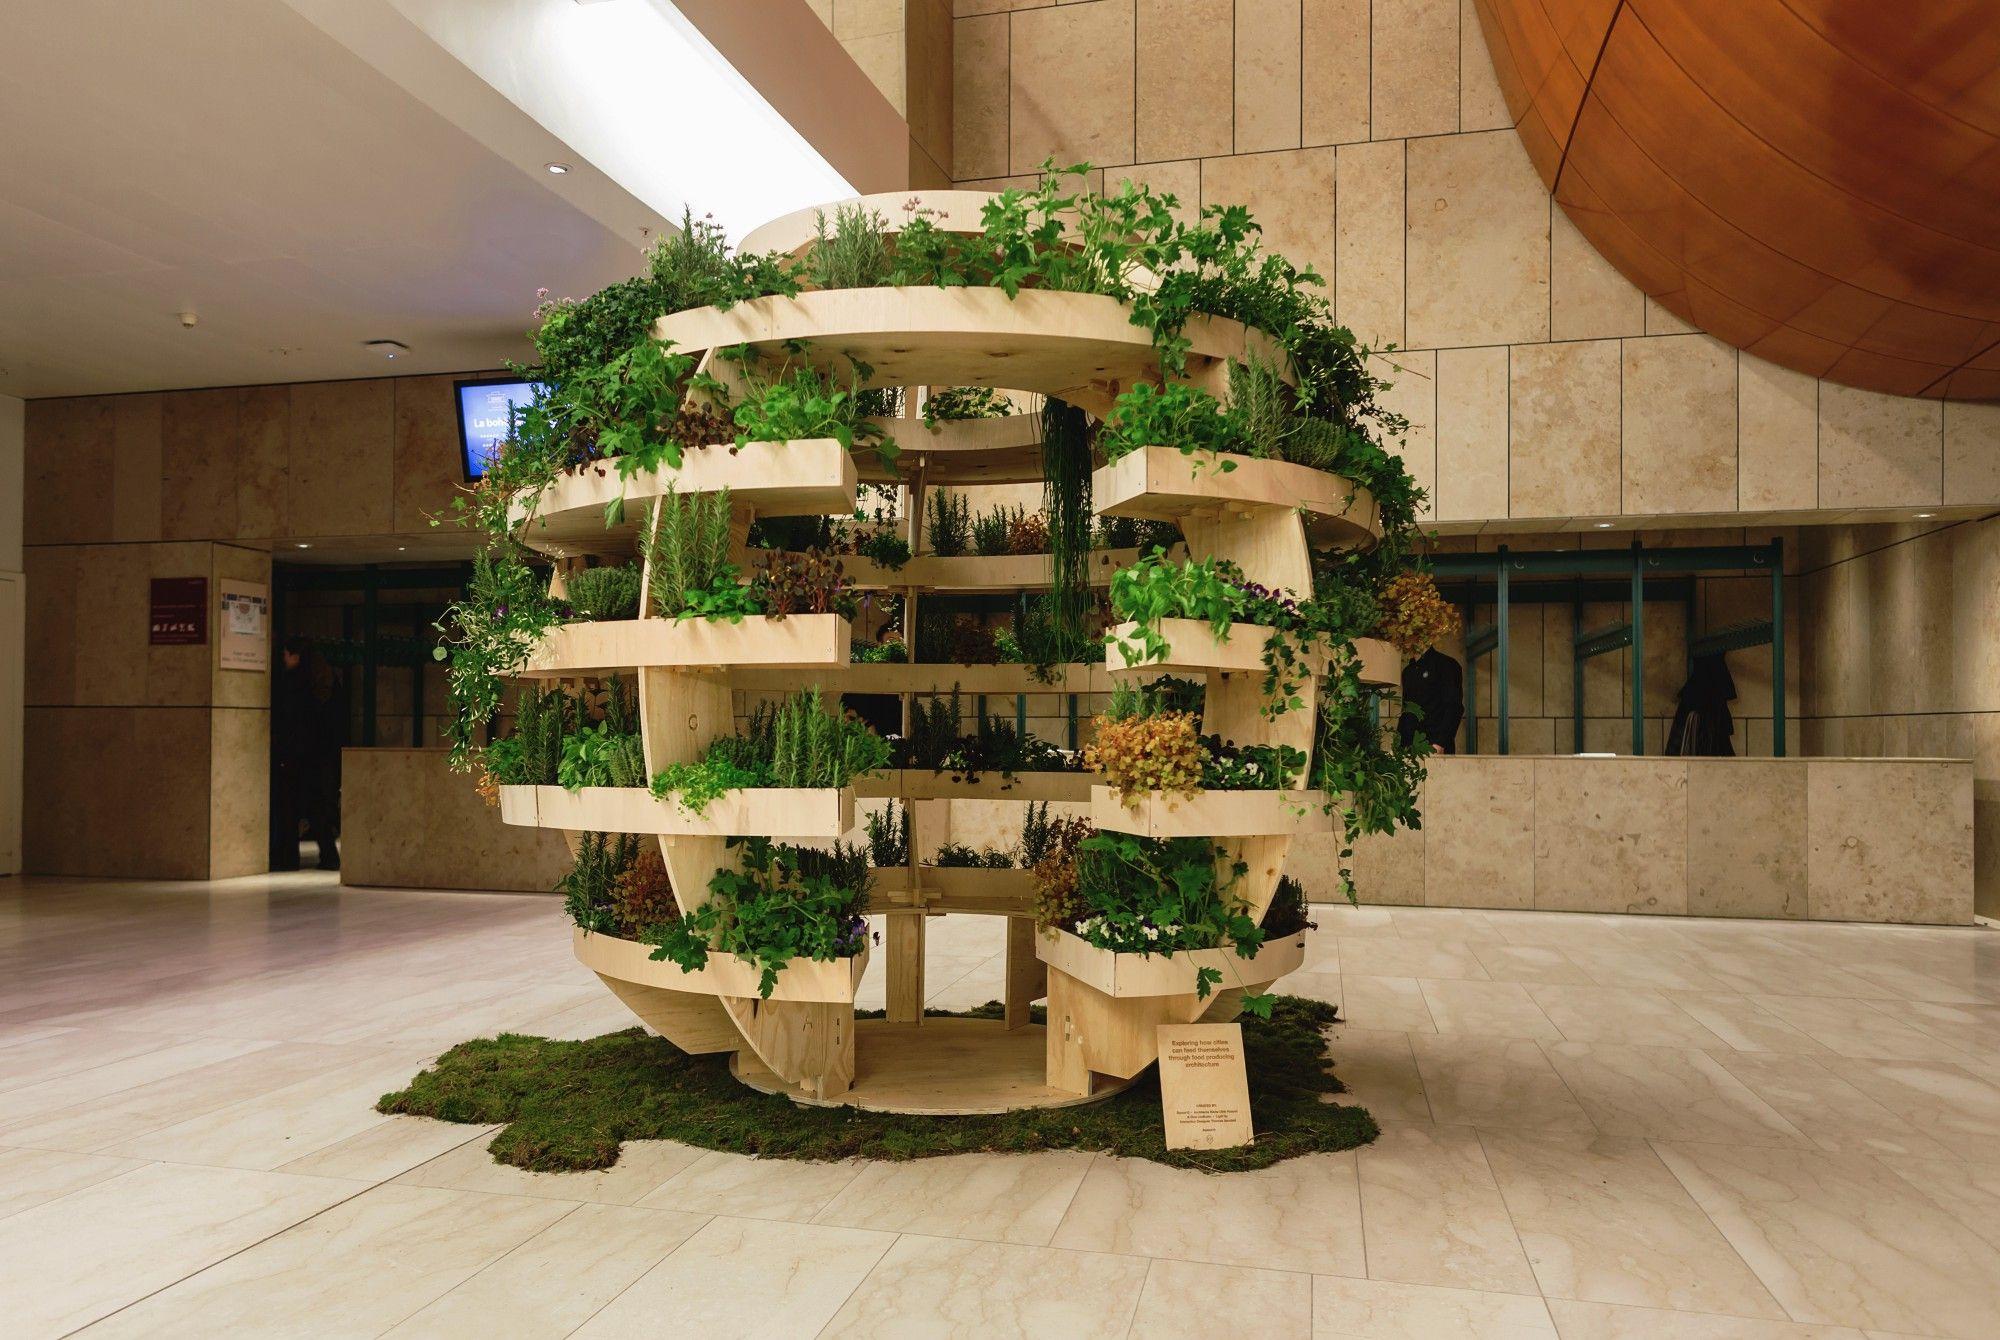 0d370c712dfd36ac584a0c215ef9f732 Meilleur De De Ikea Table Jardin Conception